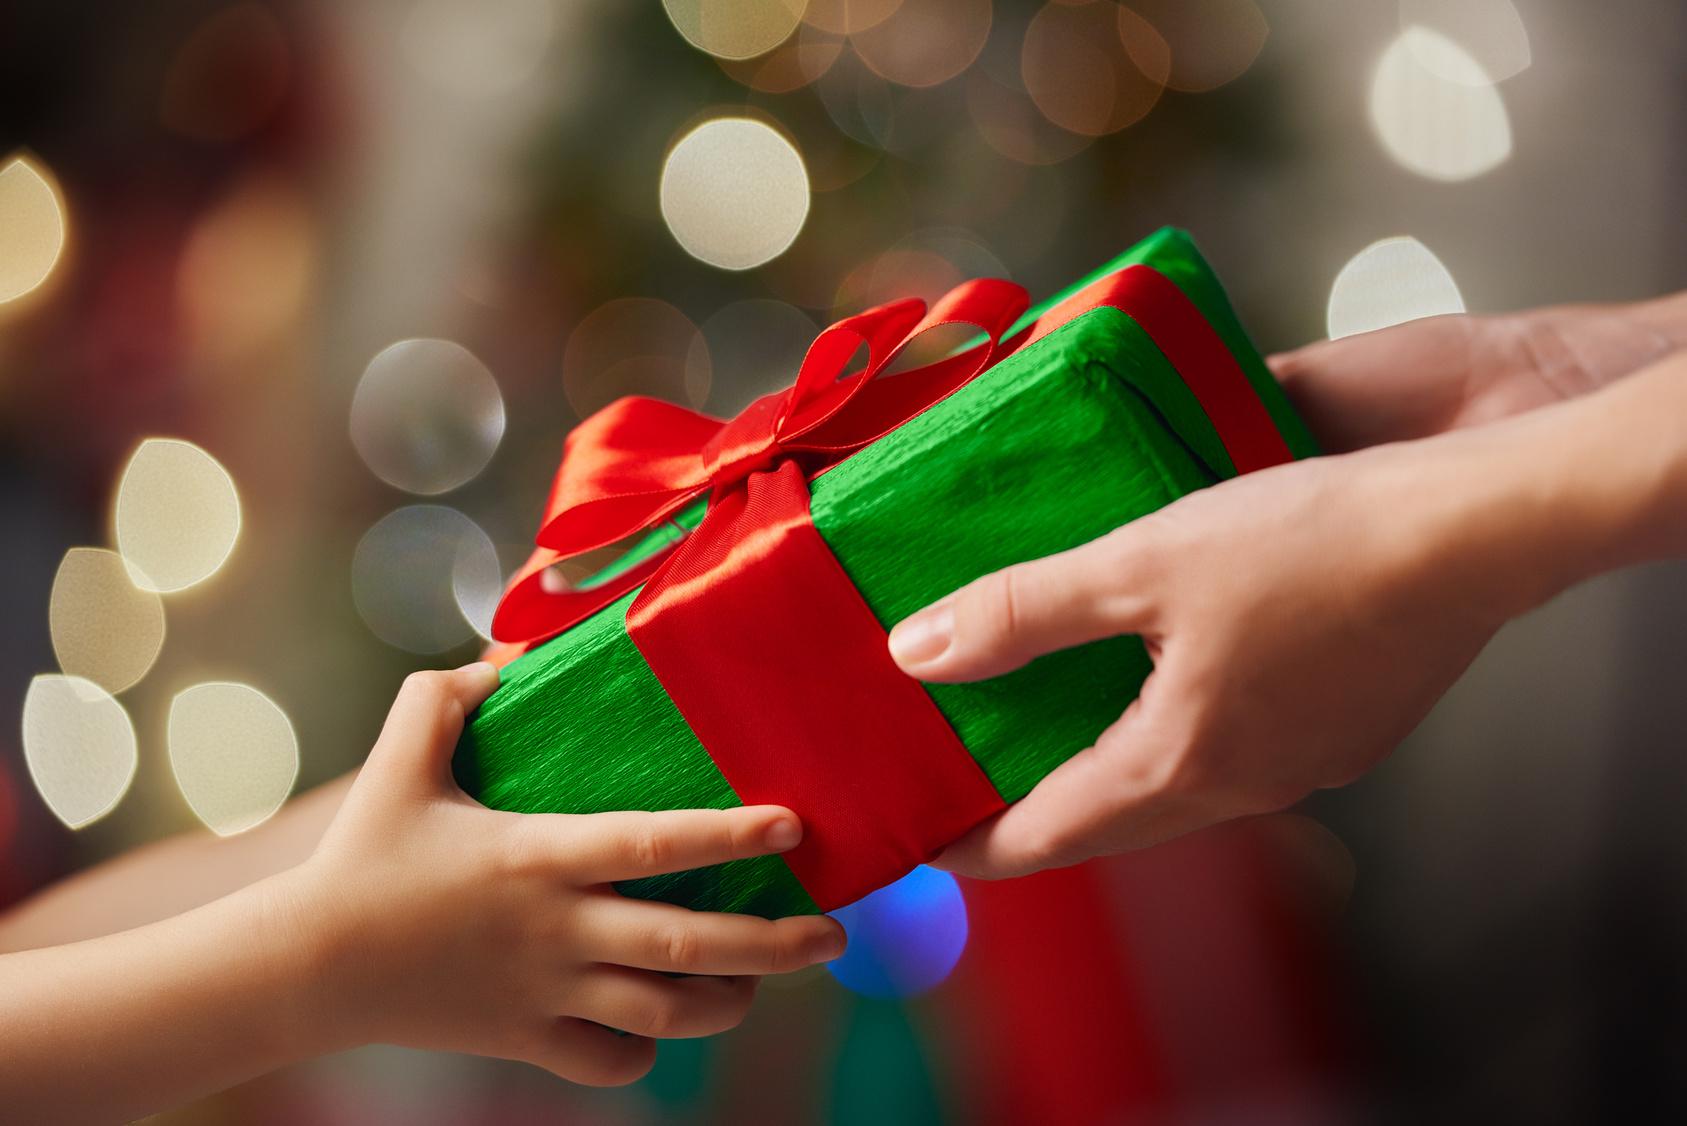 Avilla Christmas Charities Accepting Applications